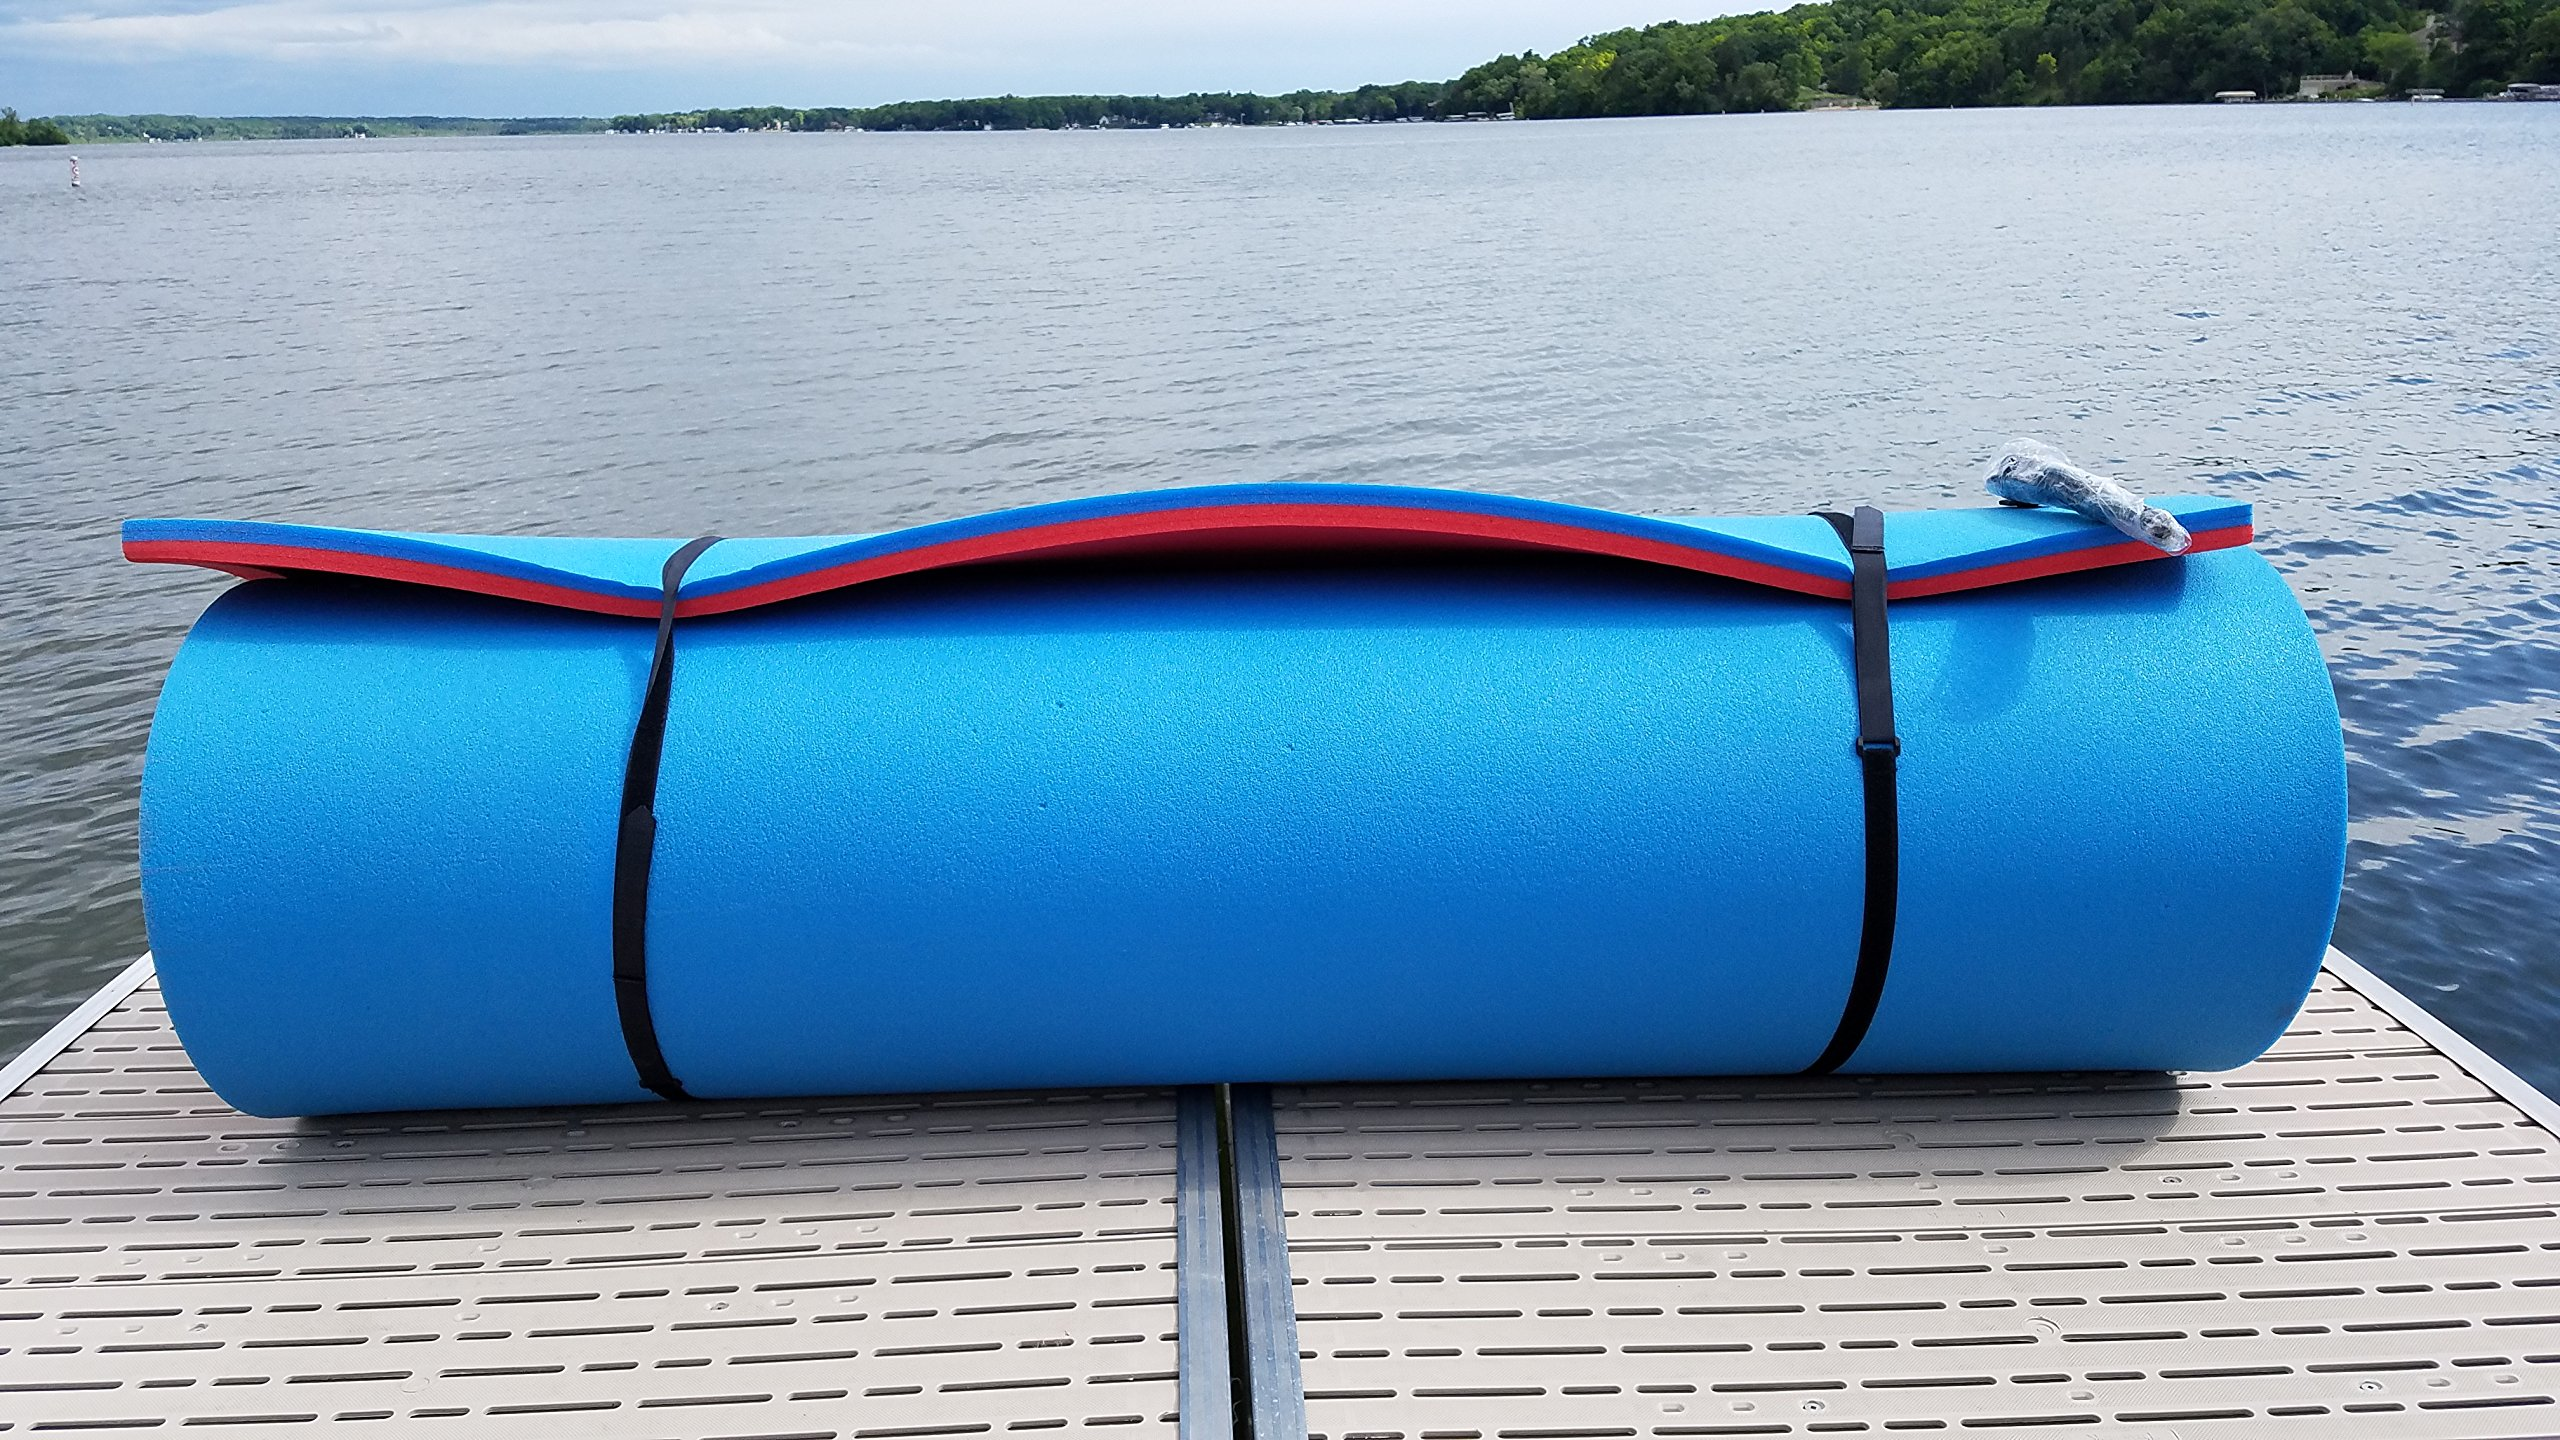 Vico Marine Floating Foam Pad - Red/Blue